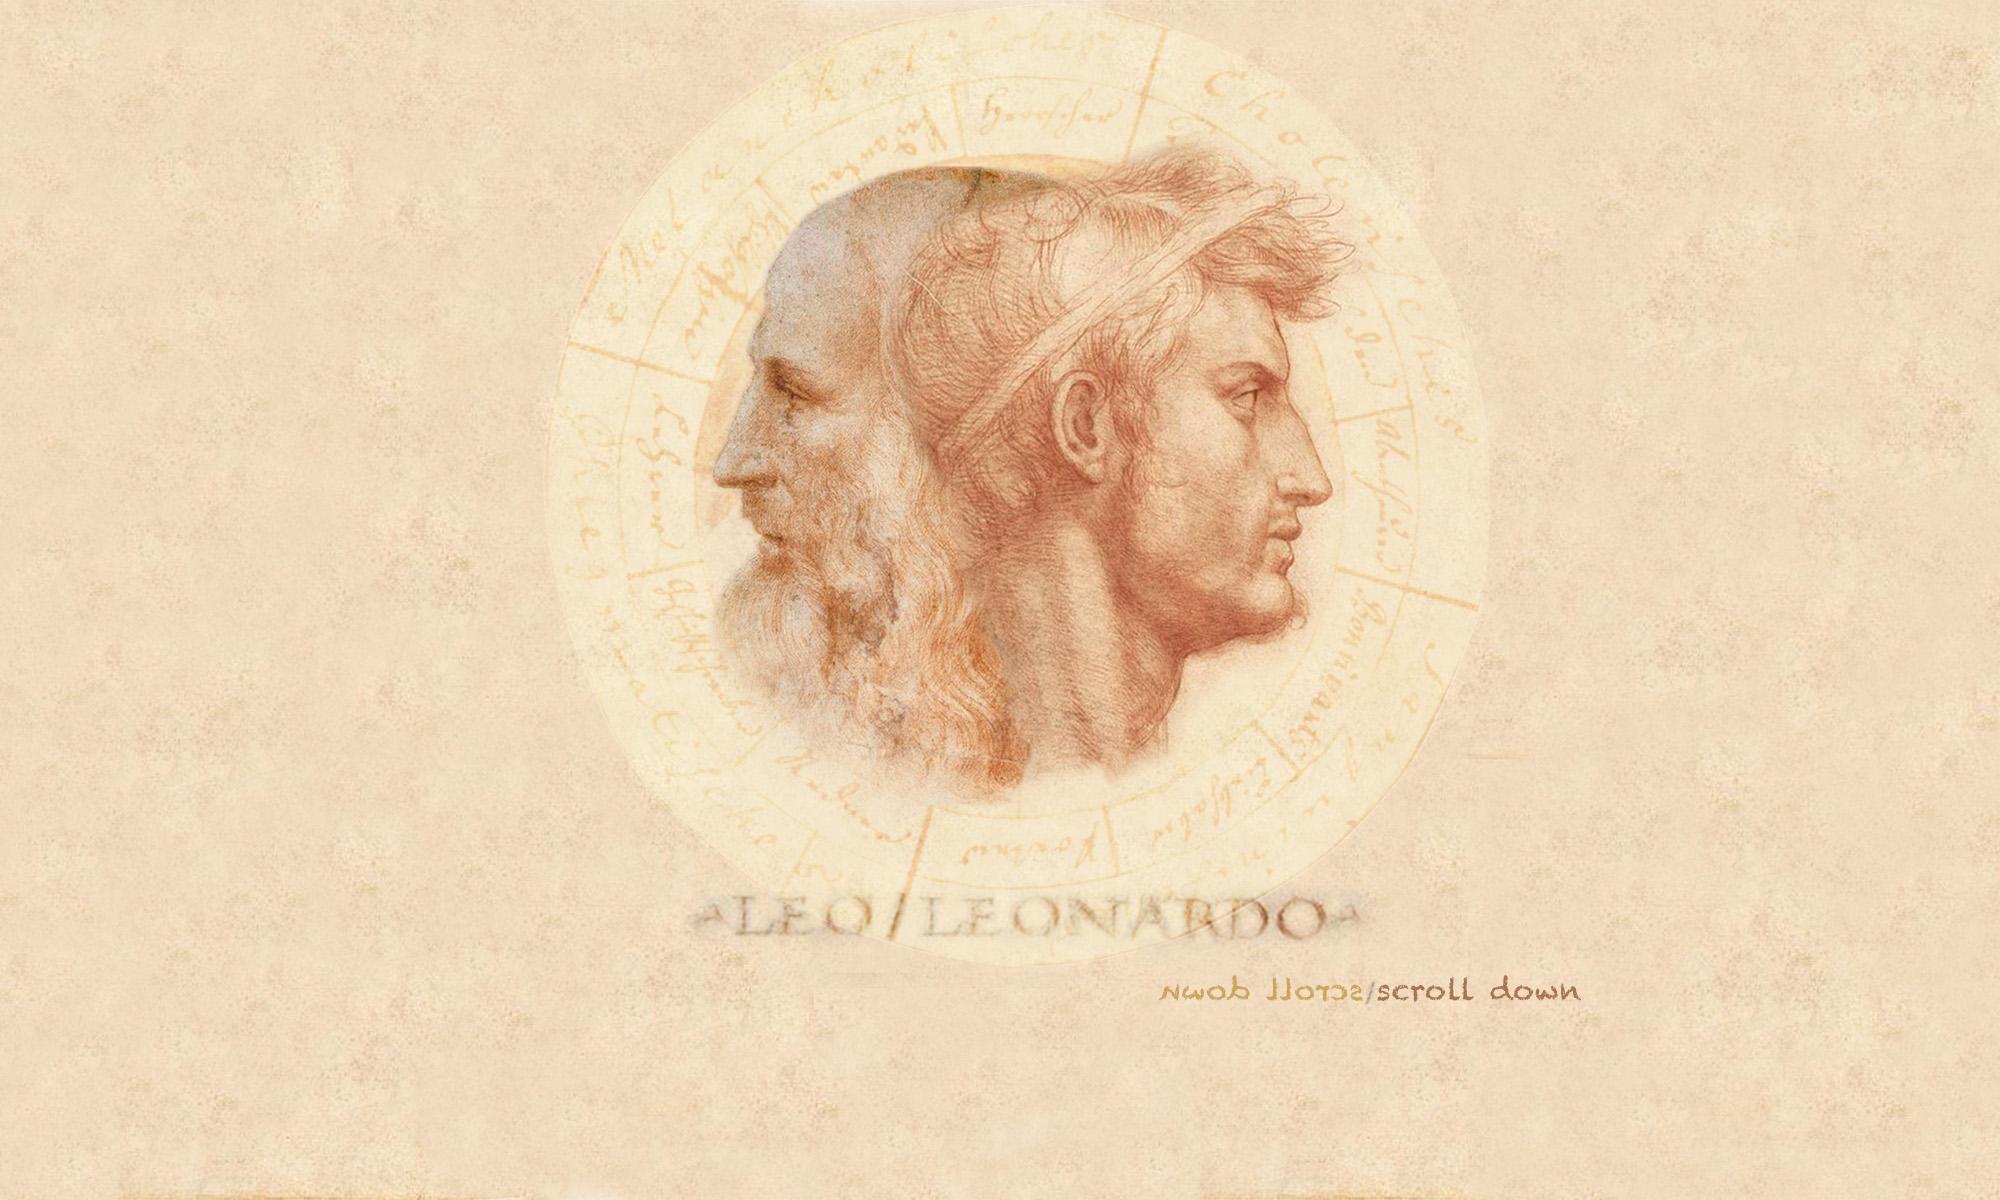 Leo/Leonardo